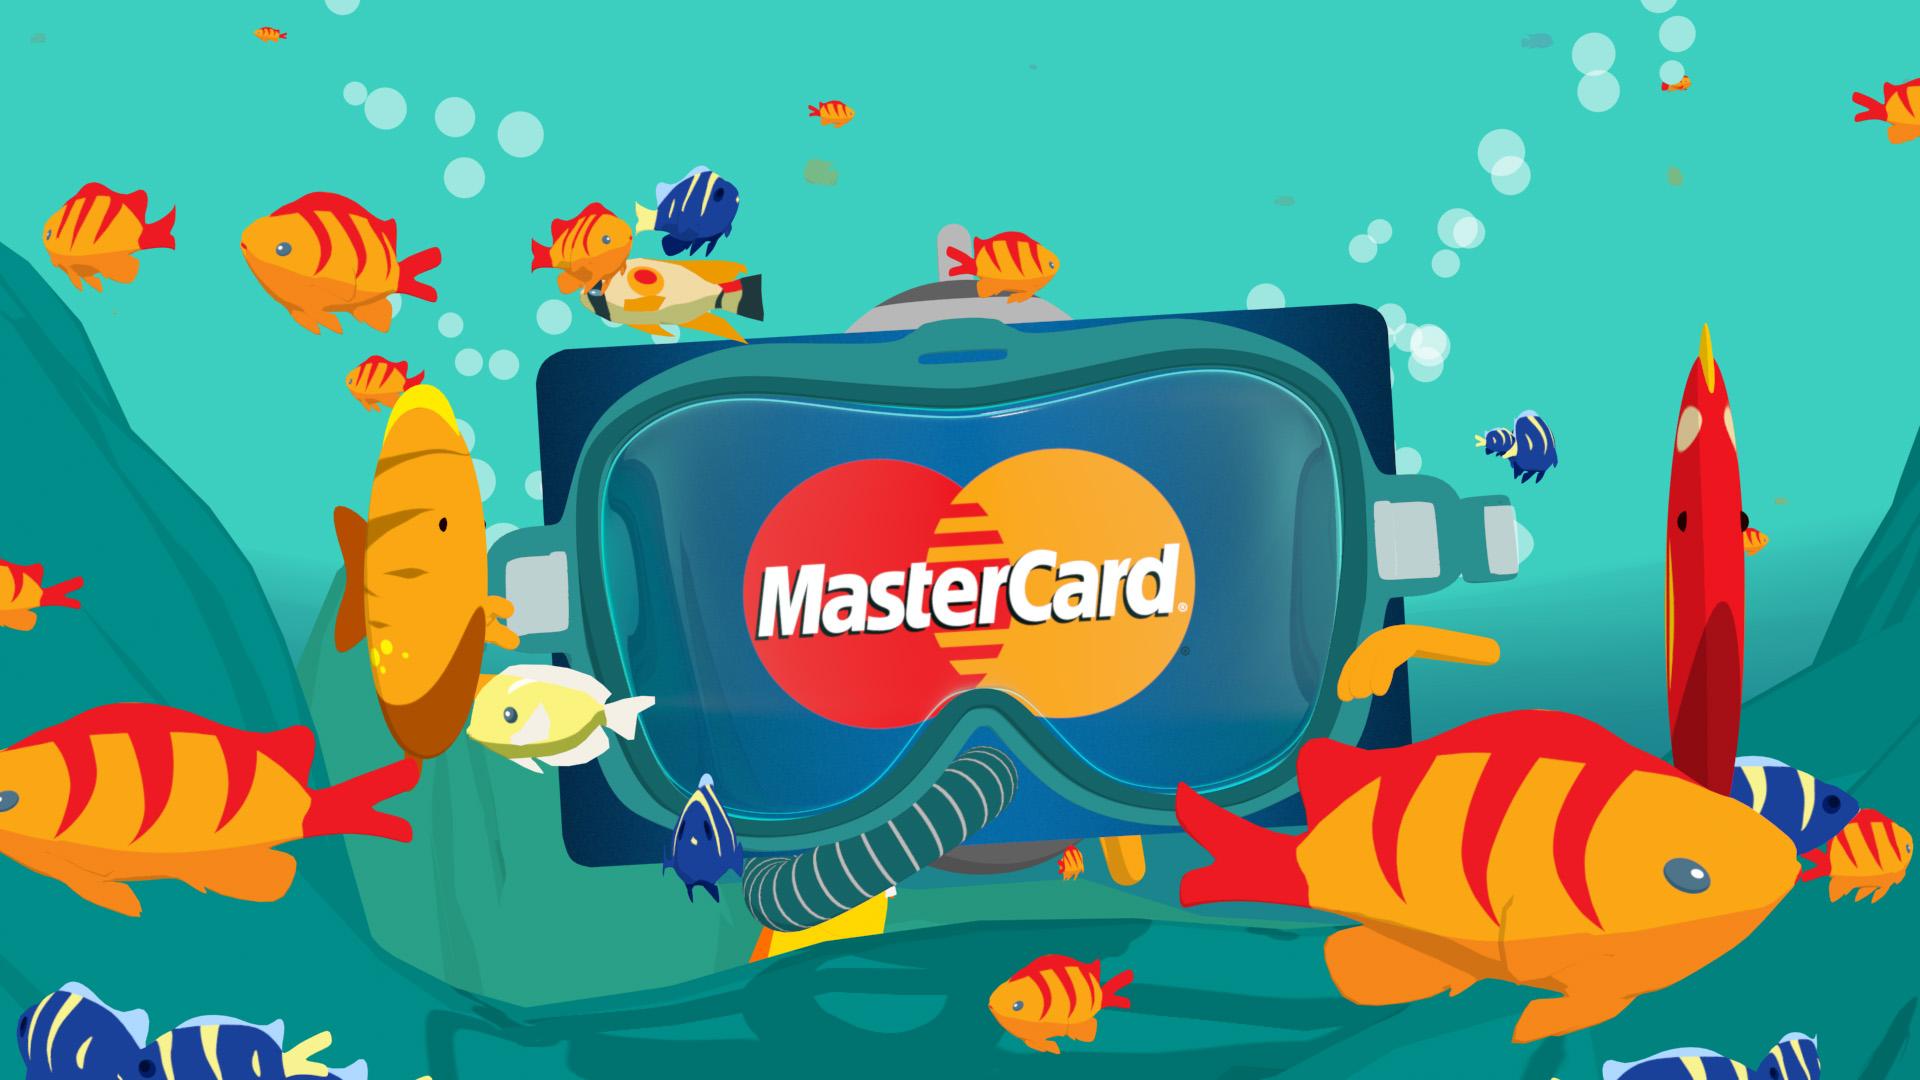 mastercard_scuba_image02